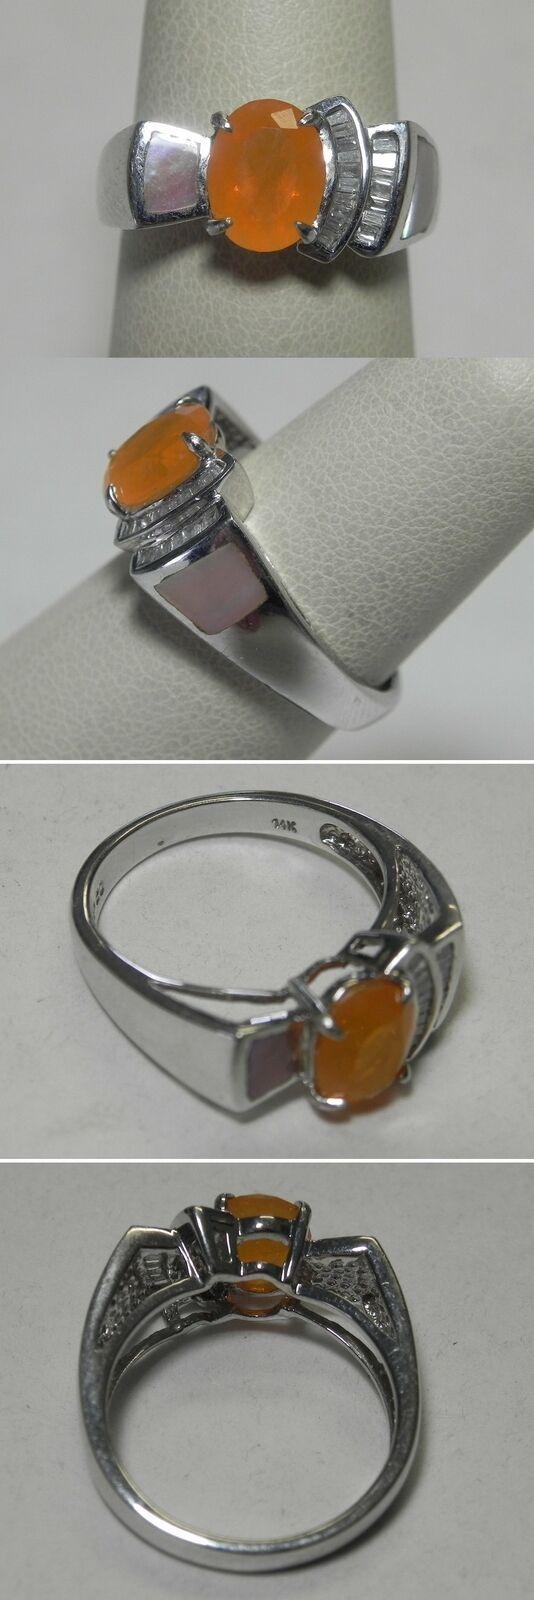 C944 Estate Designer JP Abstract 14K Solid White gold orange Fire Opal Ring Sz 7